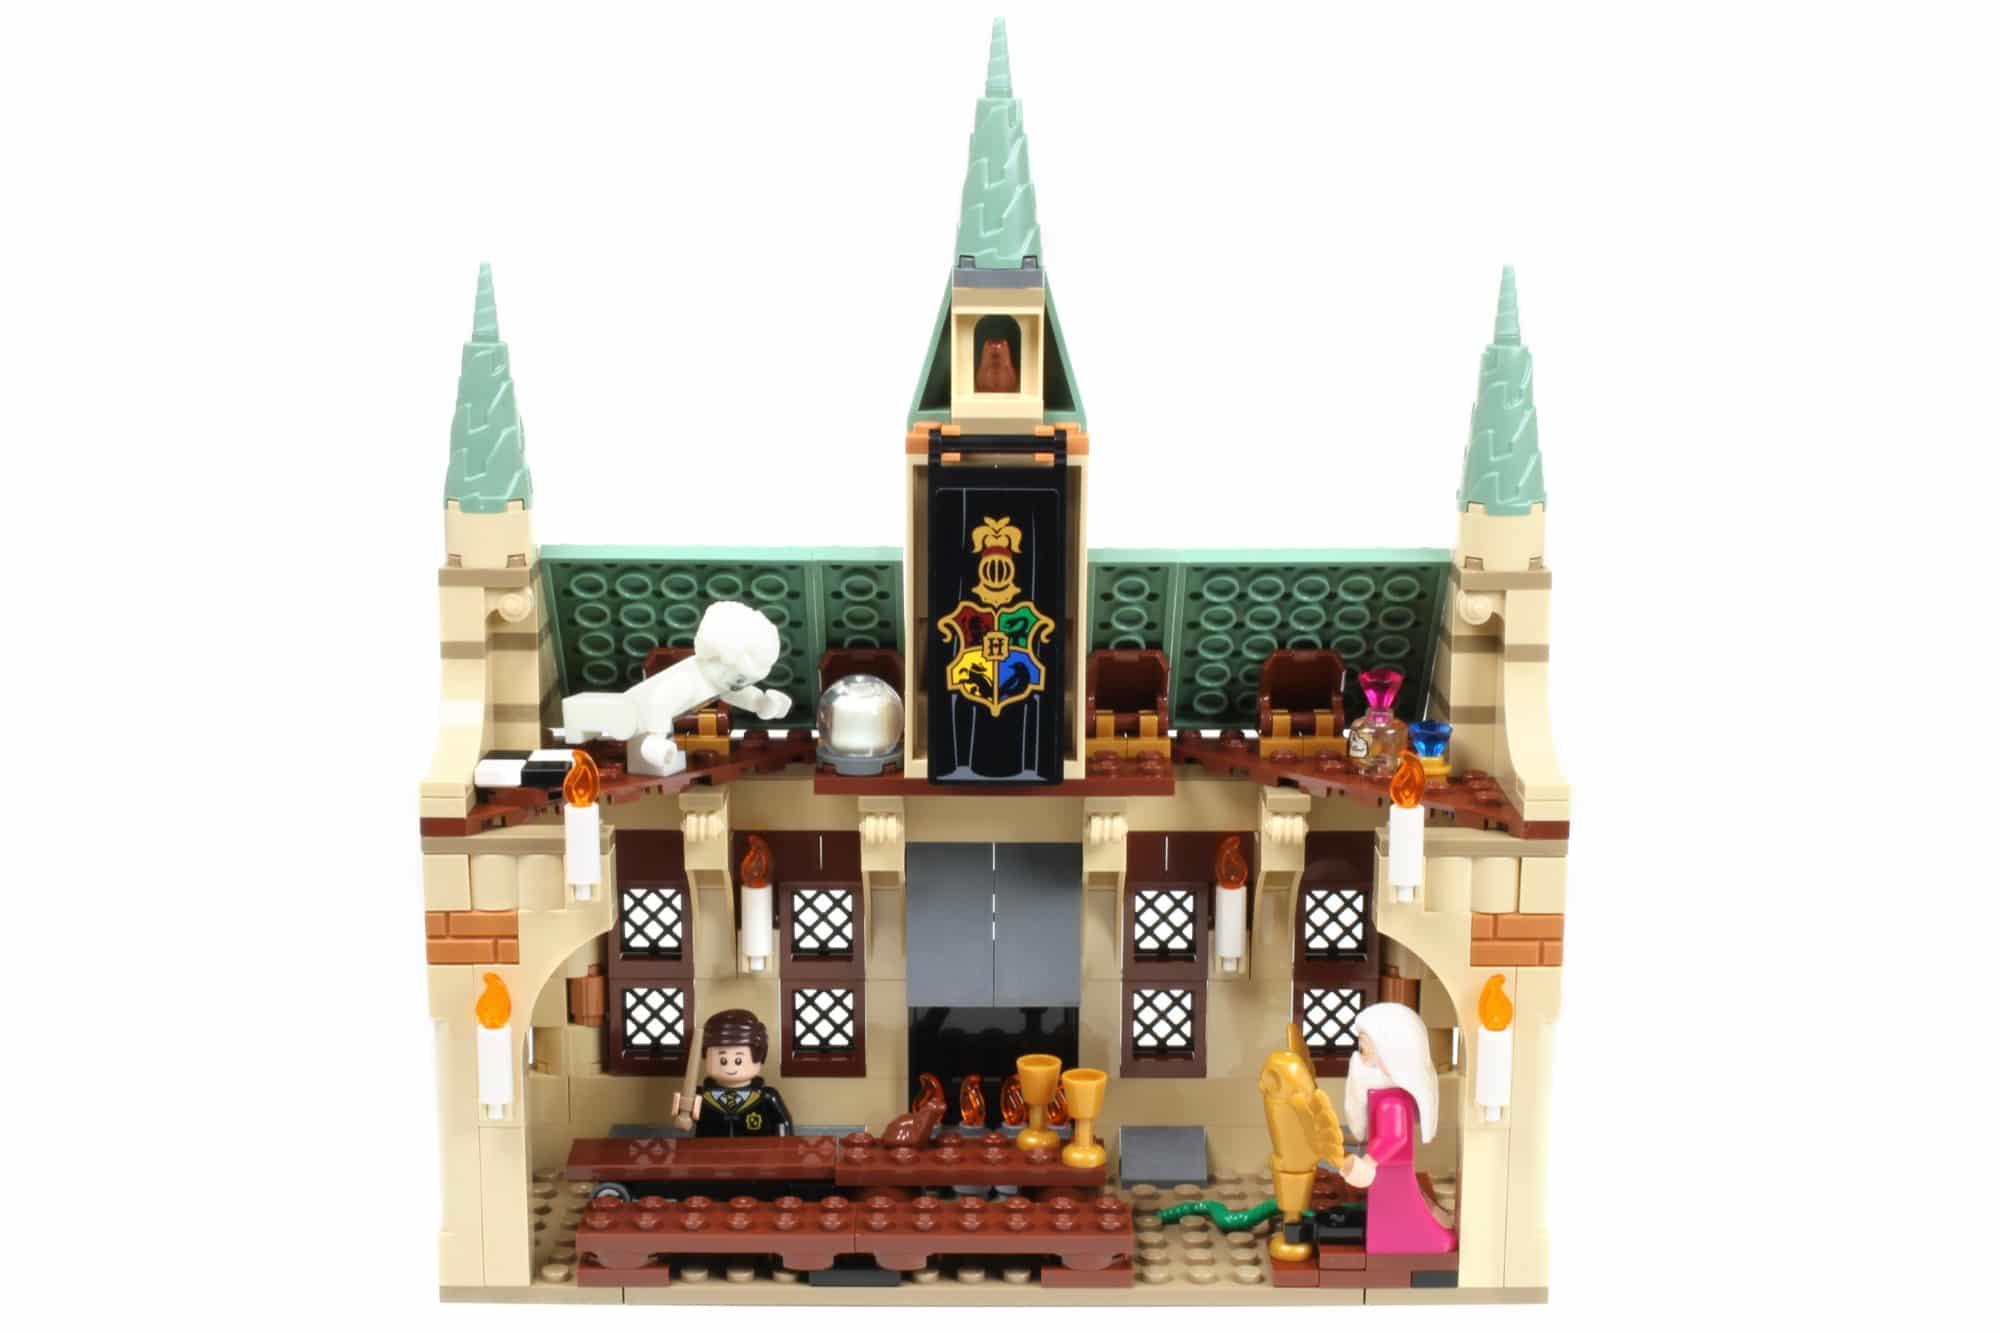 LEGO Harry Potter 76389 Hogwarts Kammer Des Schreckens Schritt 5 5